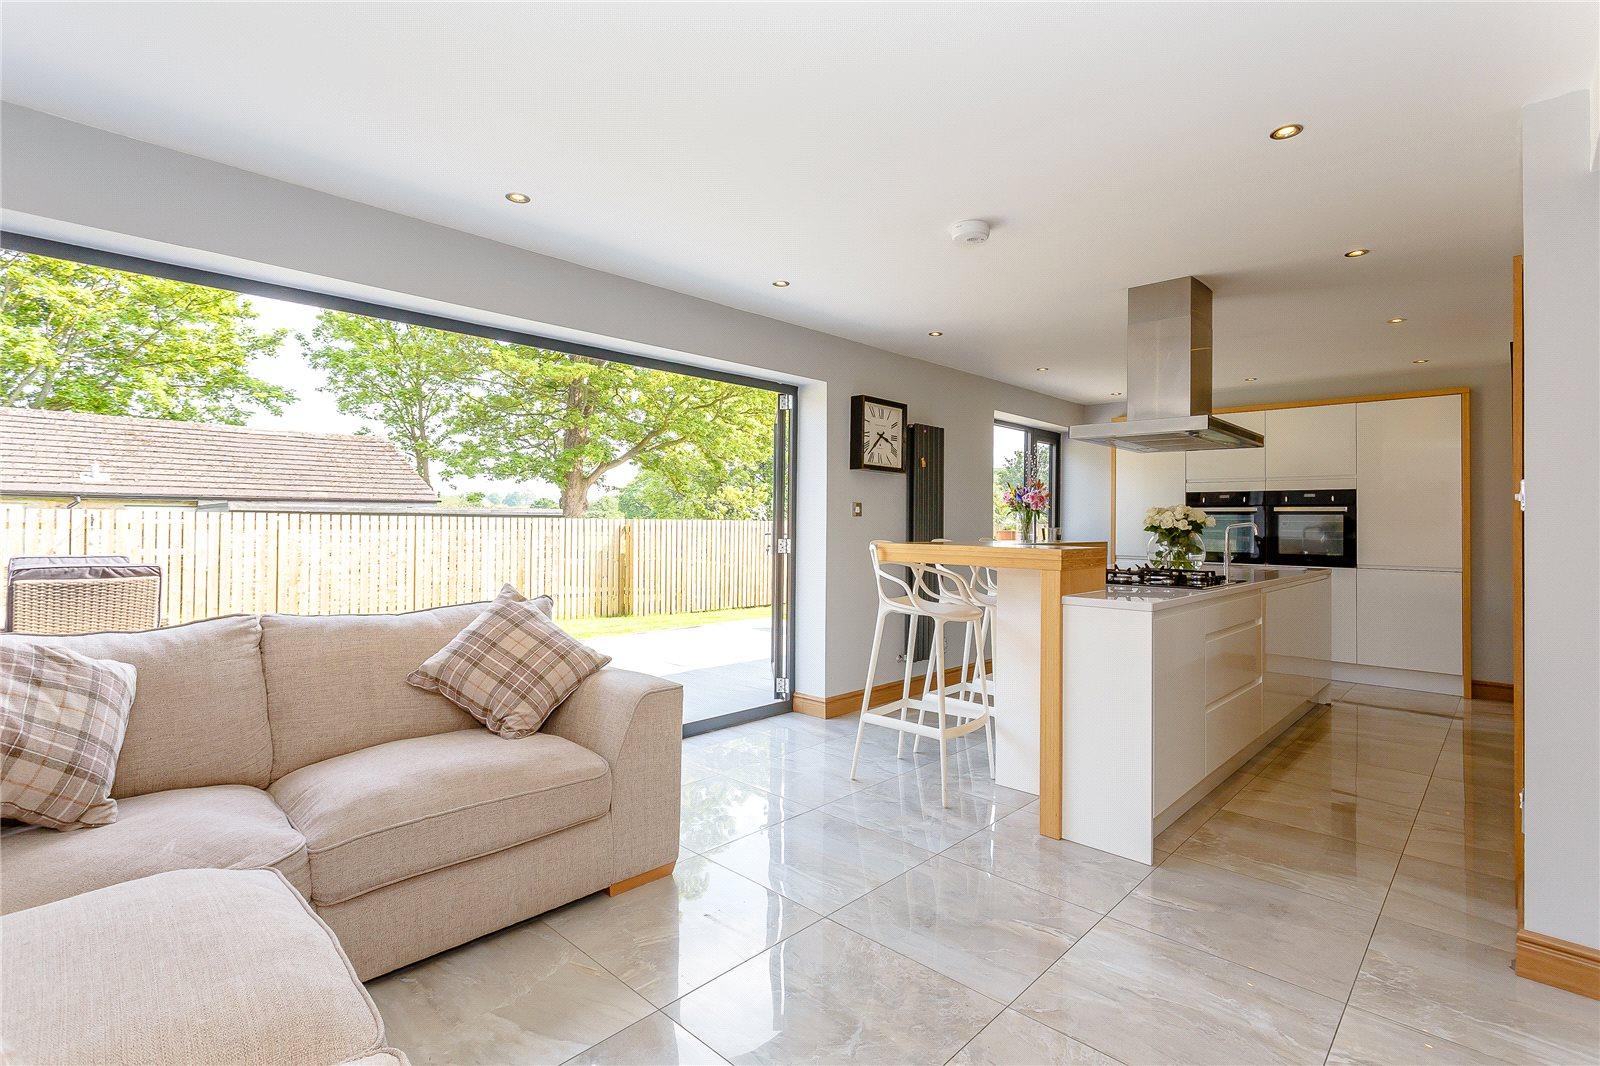 property for sale in Harrogate, interior kitchen breakfast bar and corner sofa area